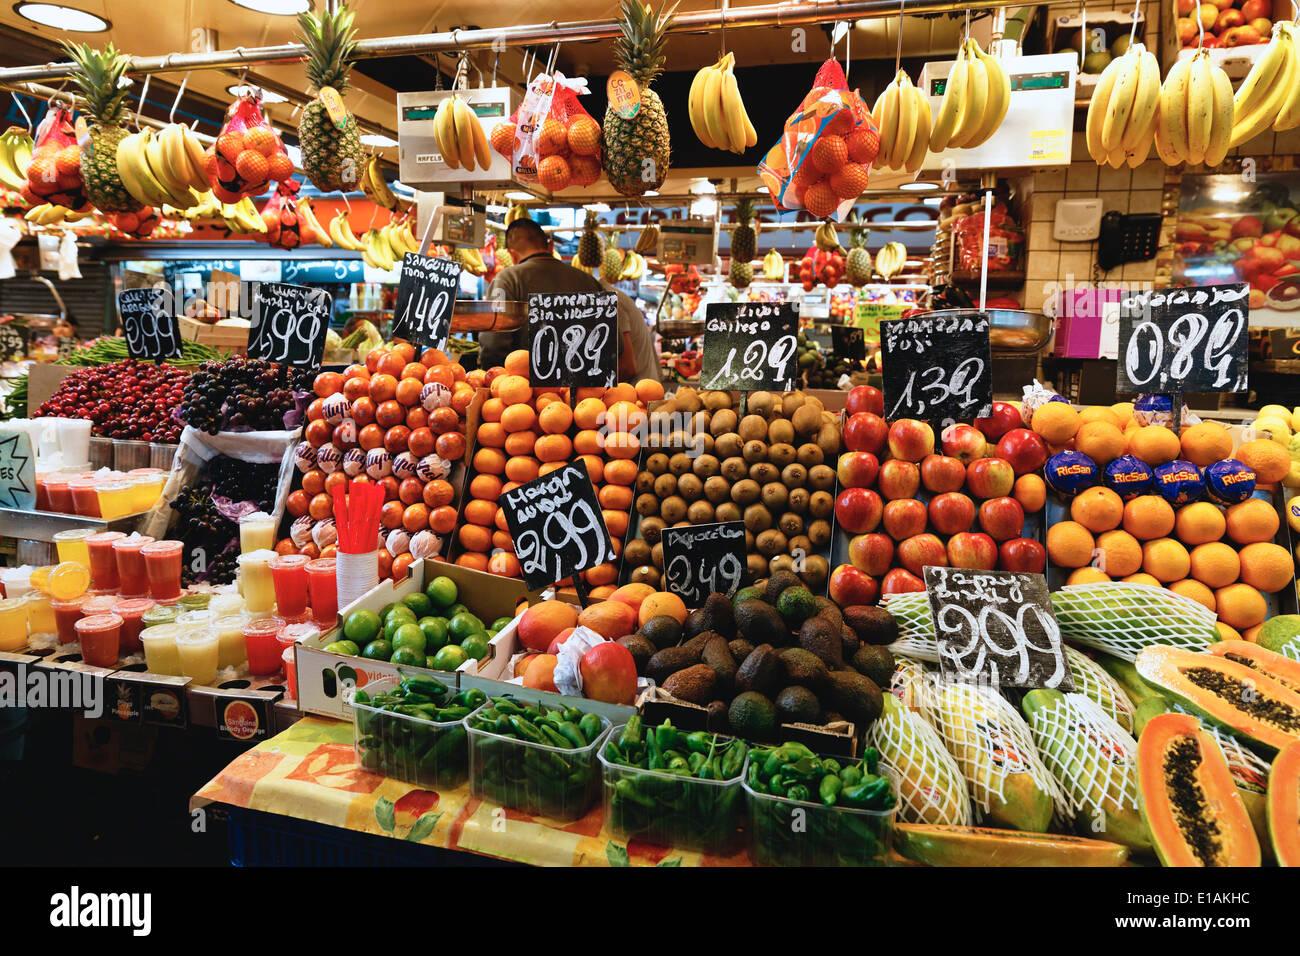 Fruits and vegetables for sale at La Boqueria Market, Barcelona, Catalonia, Spain Stock Photo